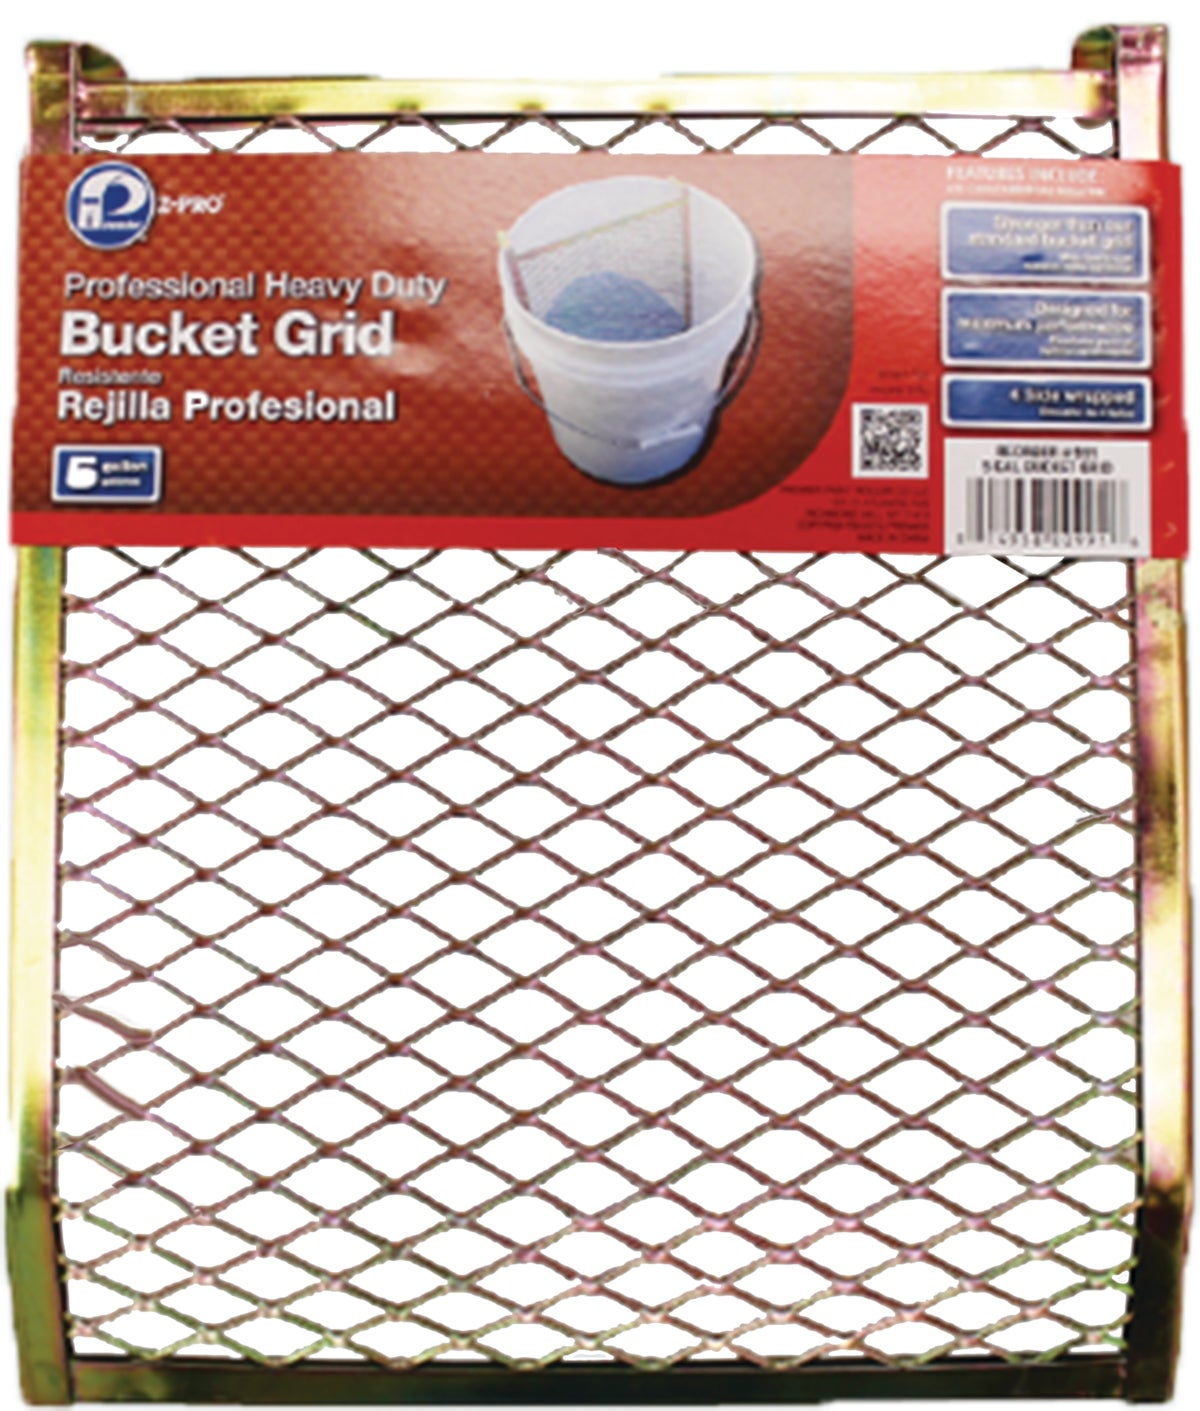 Heavy Duty 5 Gallon Paint Grid 4 sided case of 24